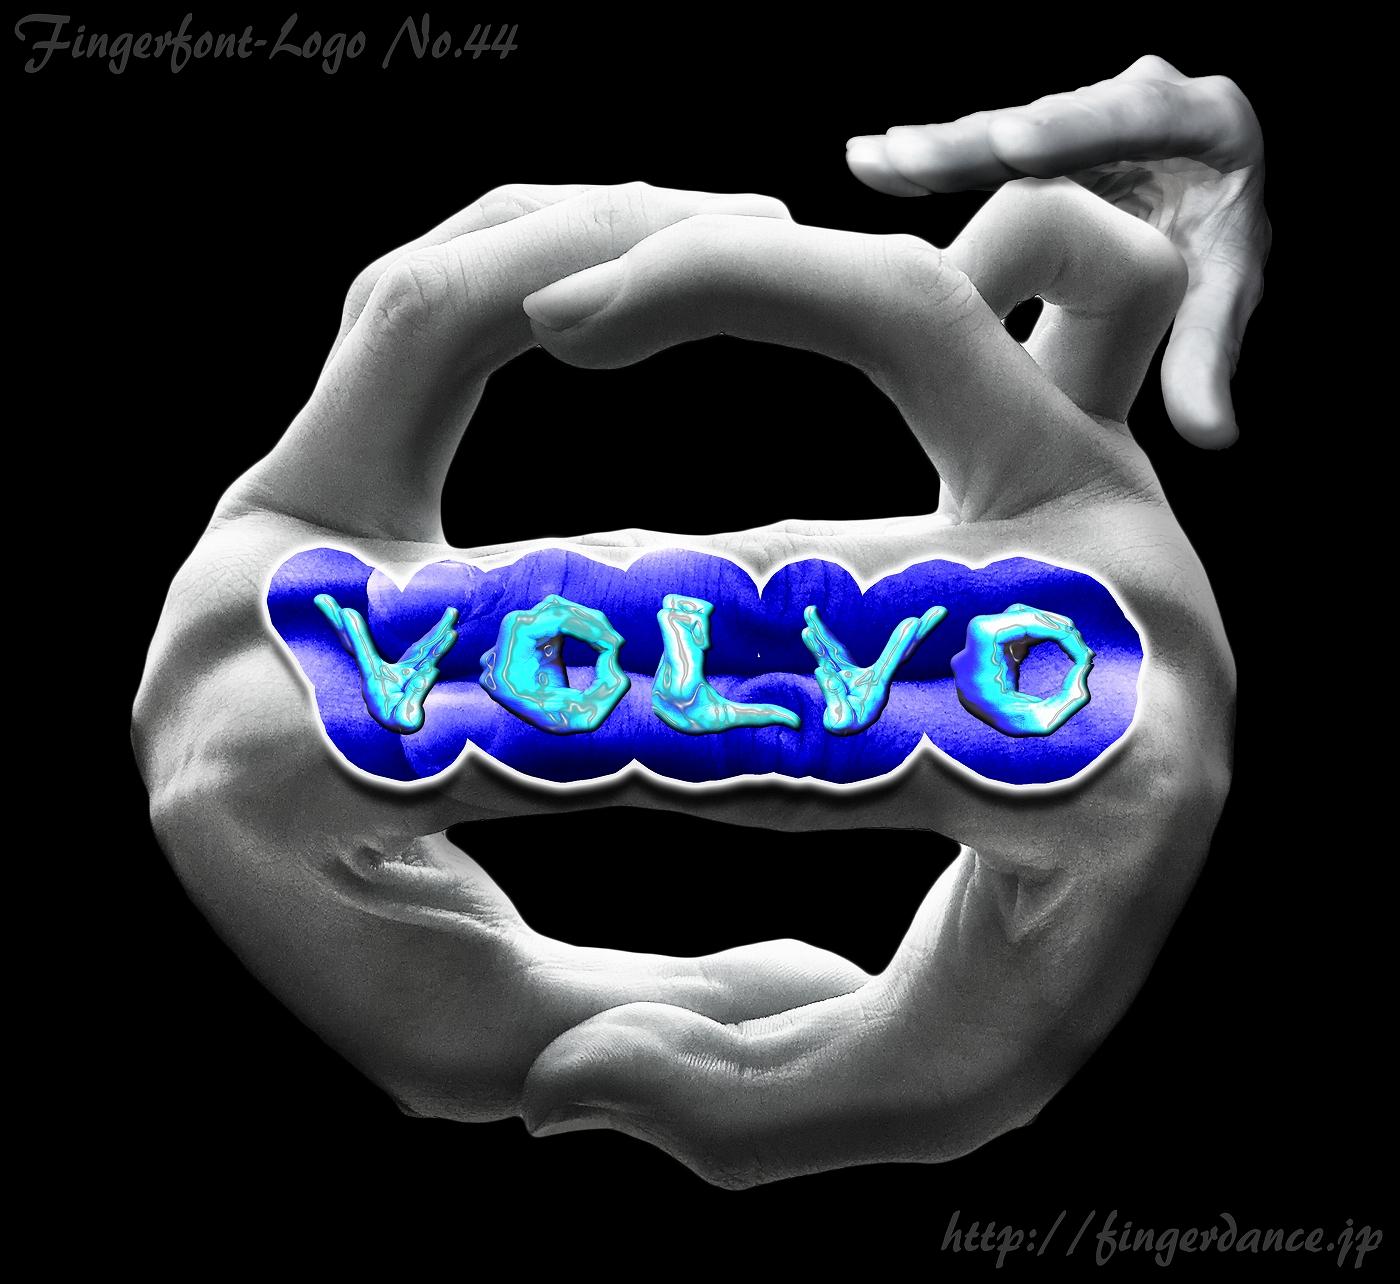 VOLVO-fingerhttp://fingerdance.jp/L/logohand ボルボフィンガーロゴハンド手指